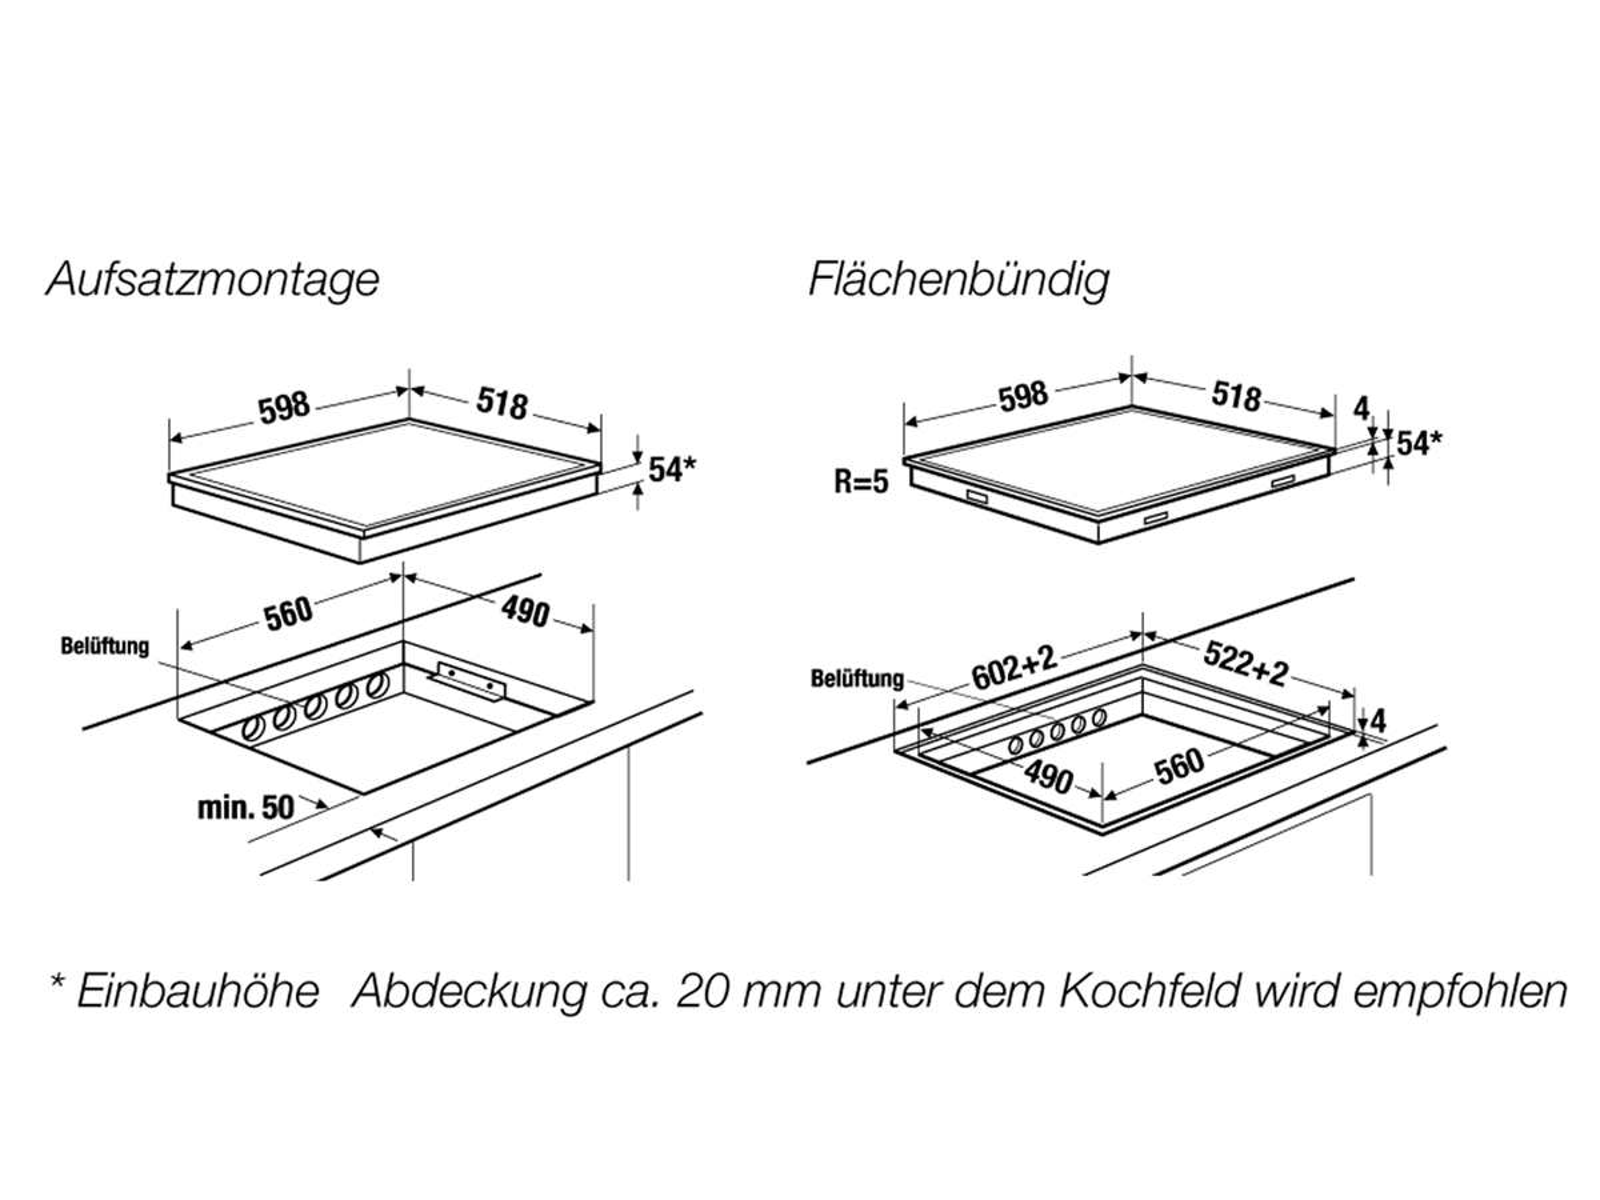 Küppersbusch KI 6520.0 WR K-Series. 5 Induktionskochfeld autark